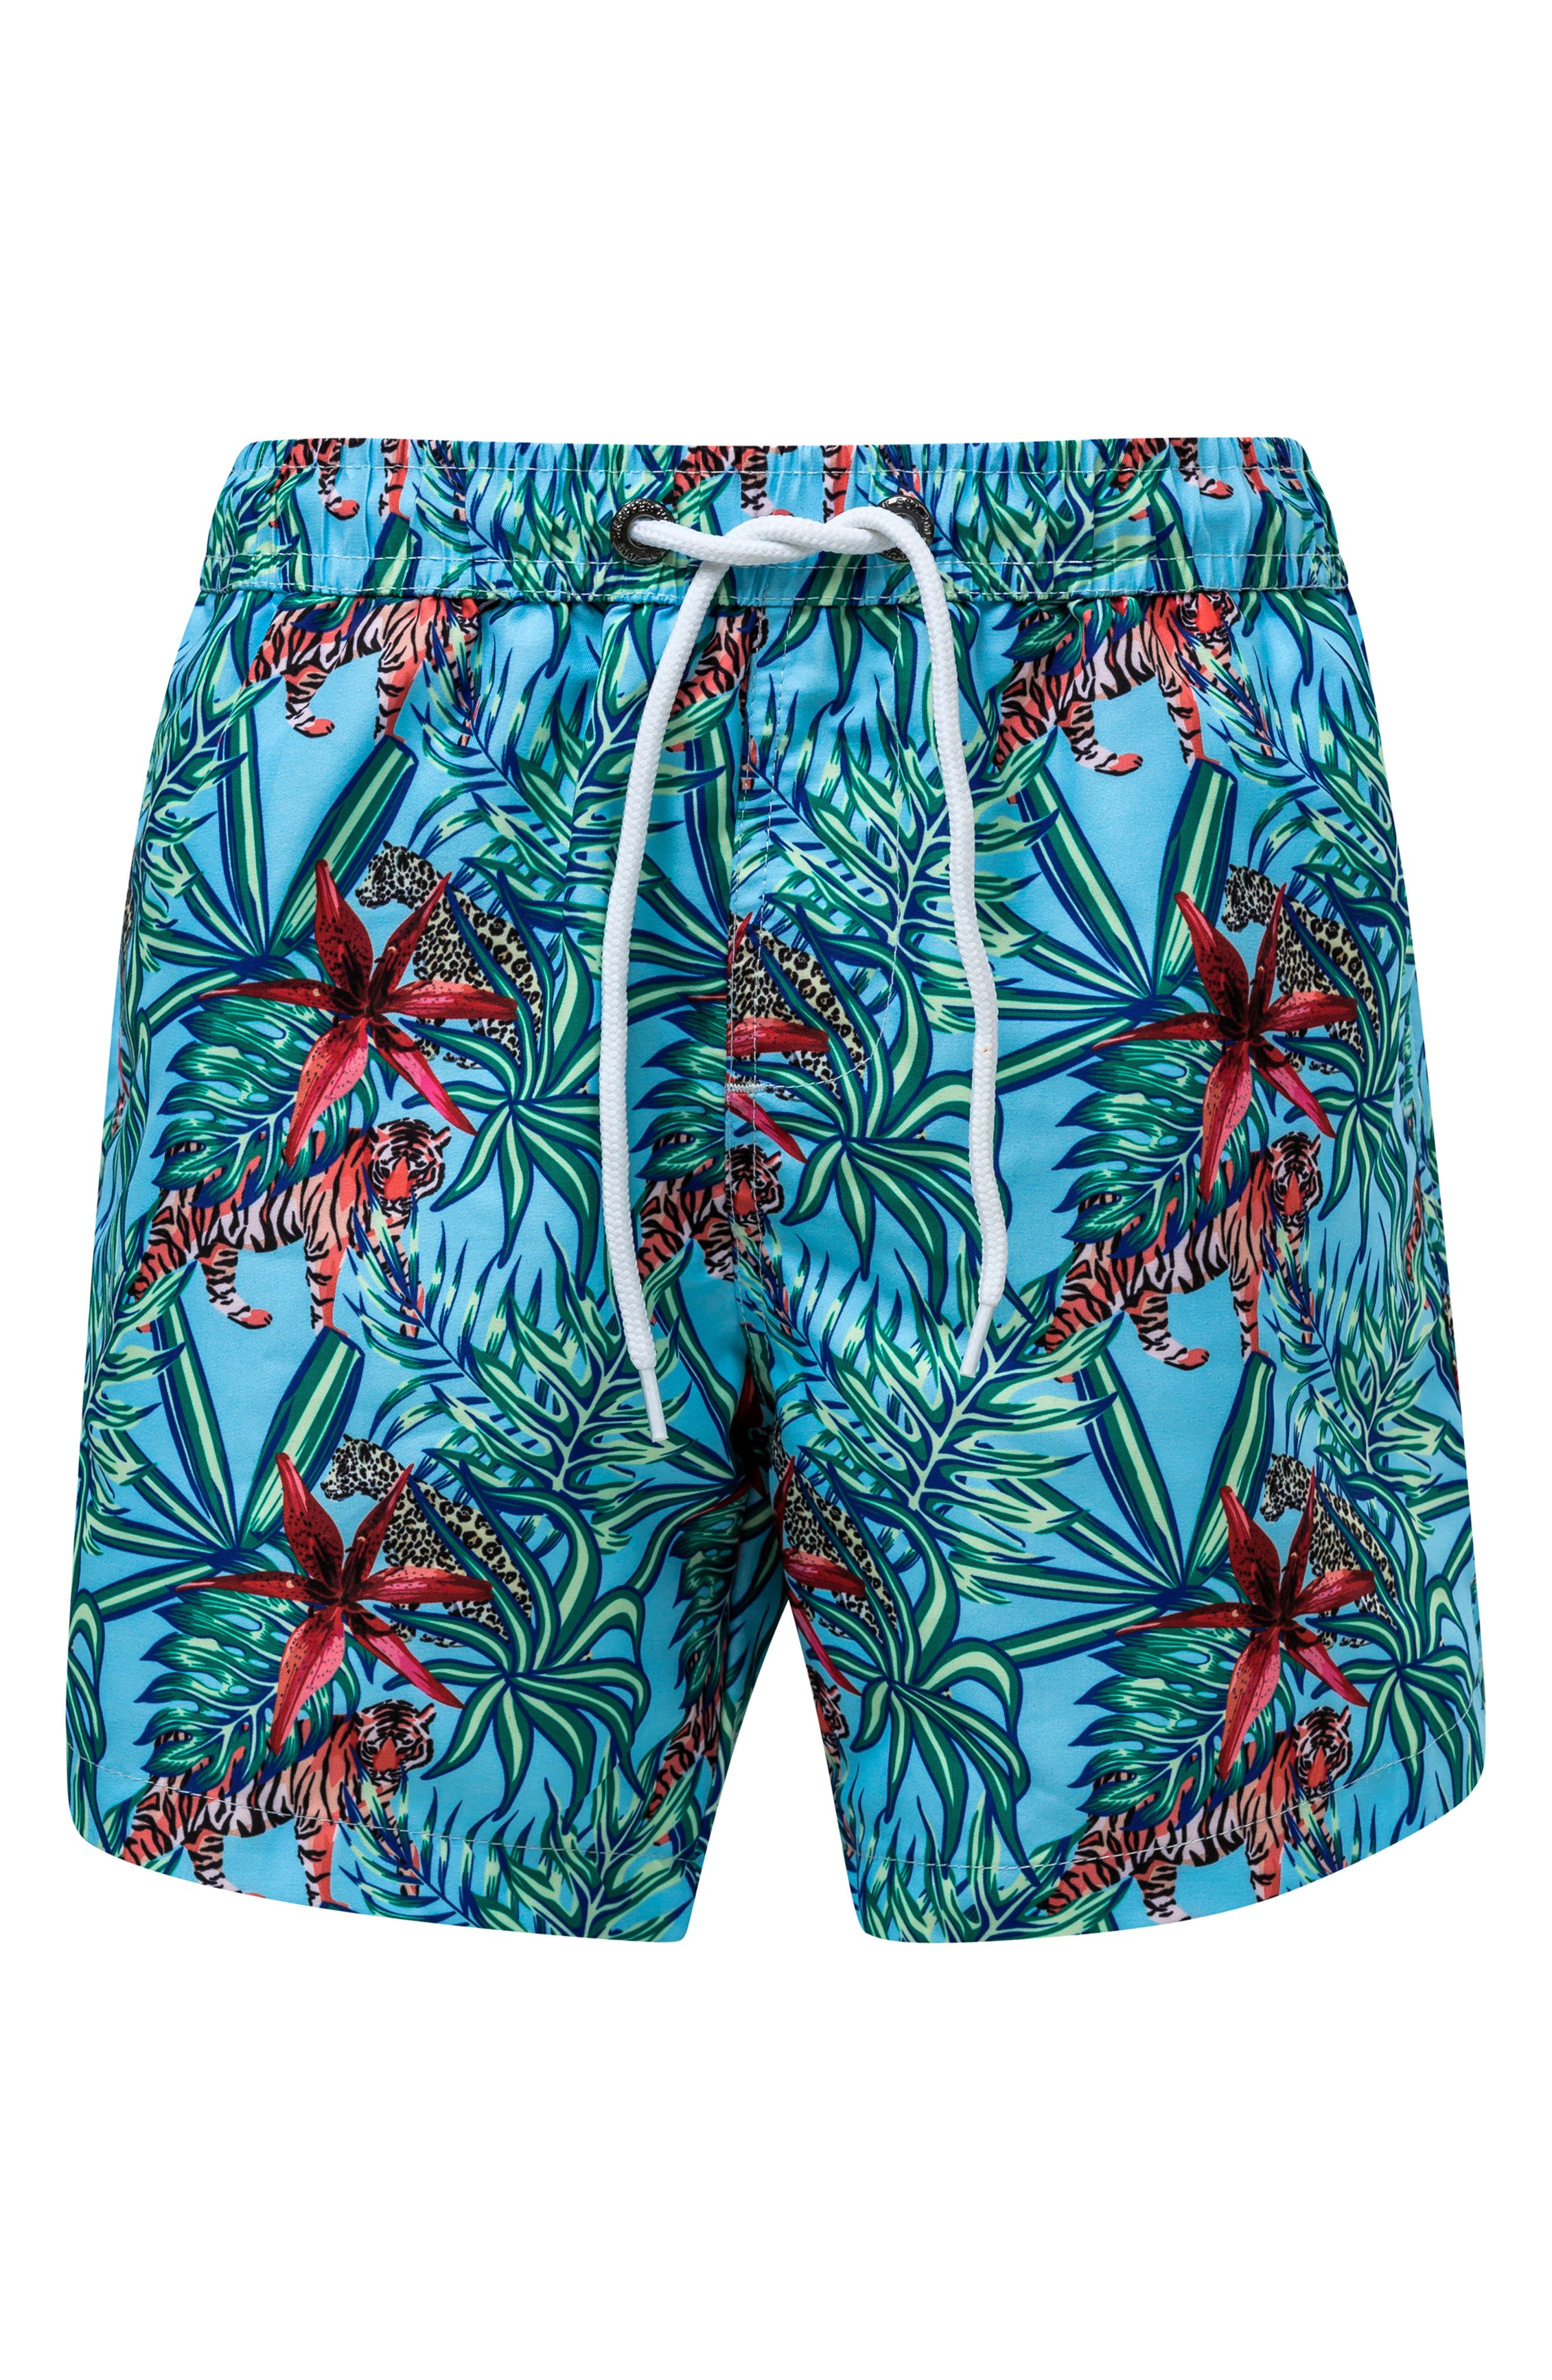 Jungle Fever Board Shorts,                         Main,                         color, OPEN BLUE